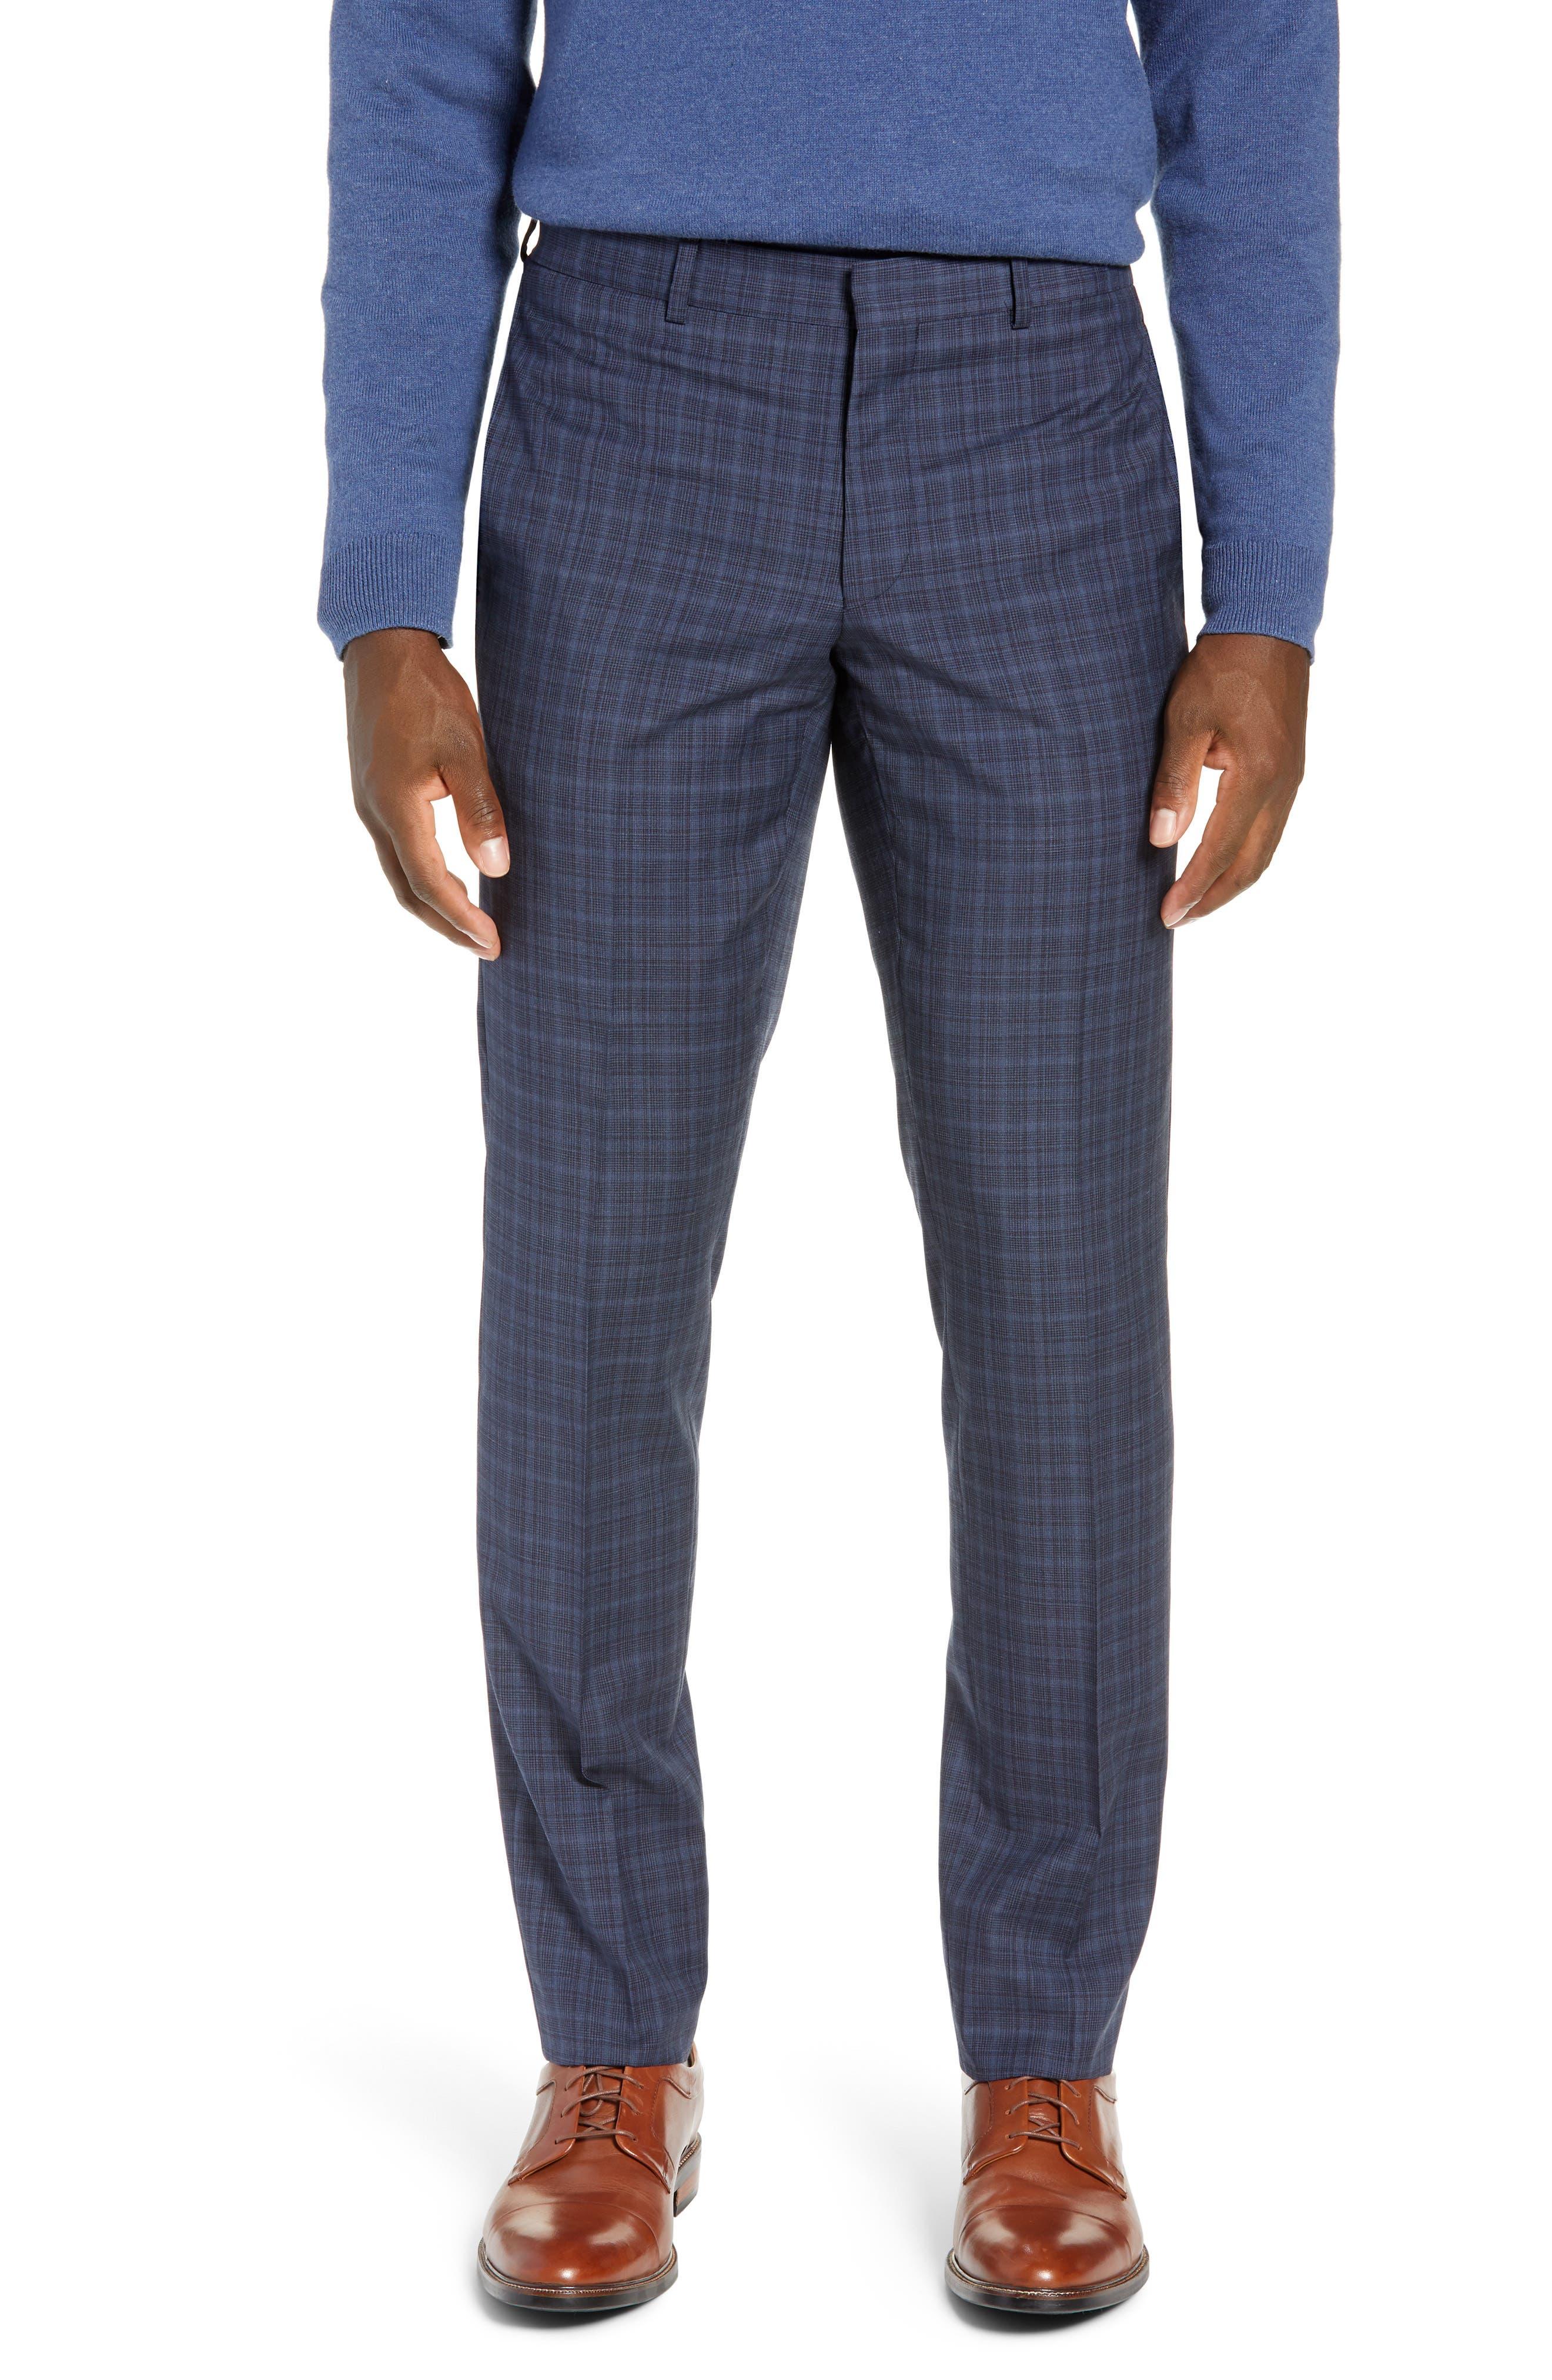 TED BAKER LONDON,                             Roger Slim Fit Plaid Wool Suit,                             Alternate thumbnail 6, color,                             GREY